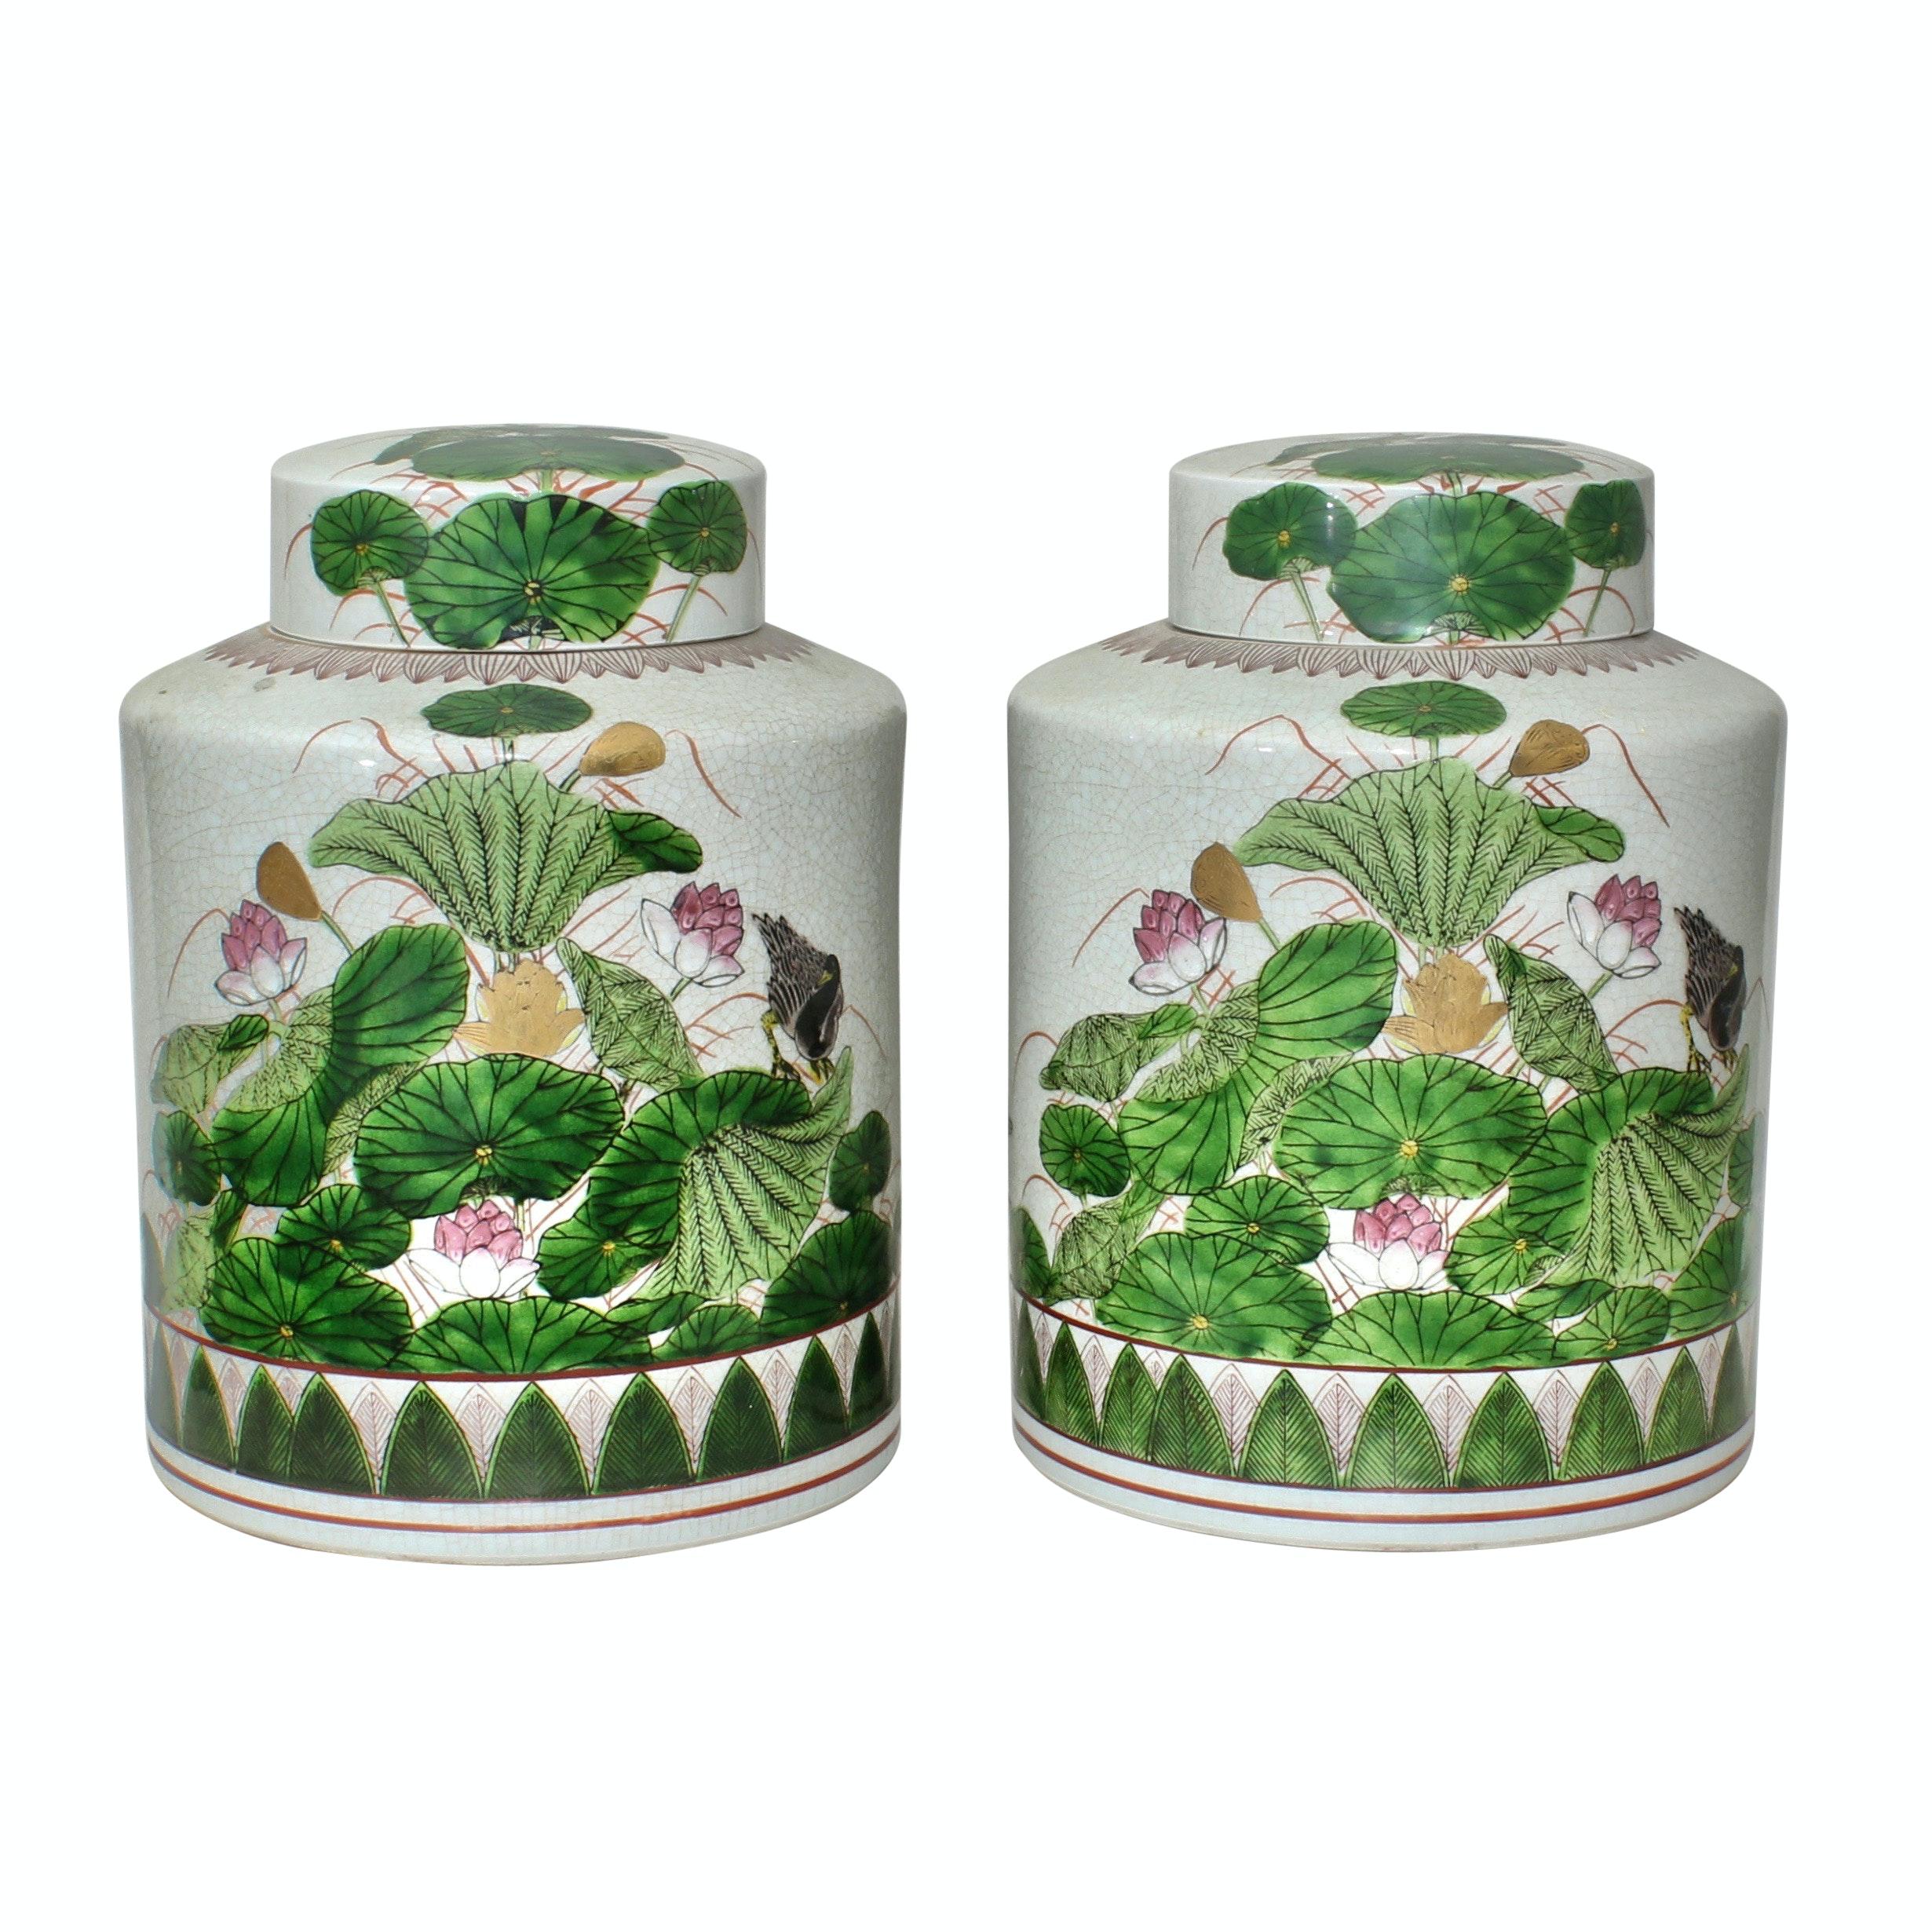 Two Vintage Fitz and Floyd Lidded Japanese Ceramic Jars